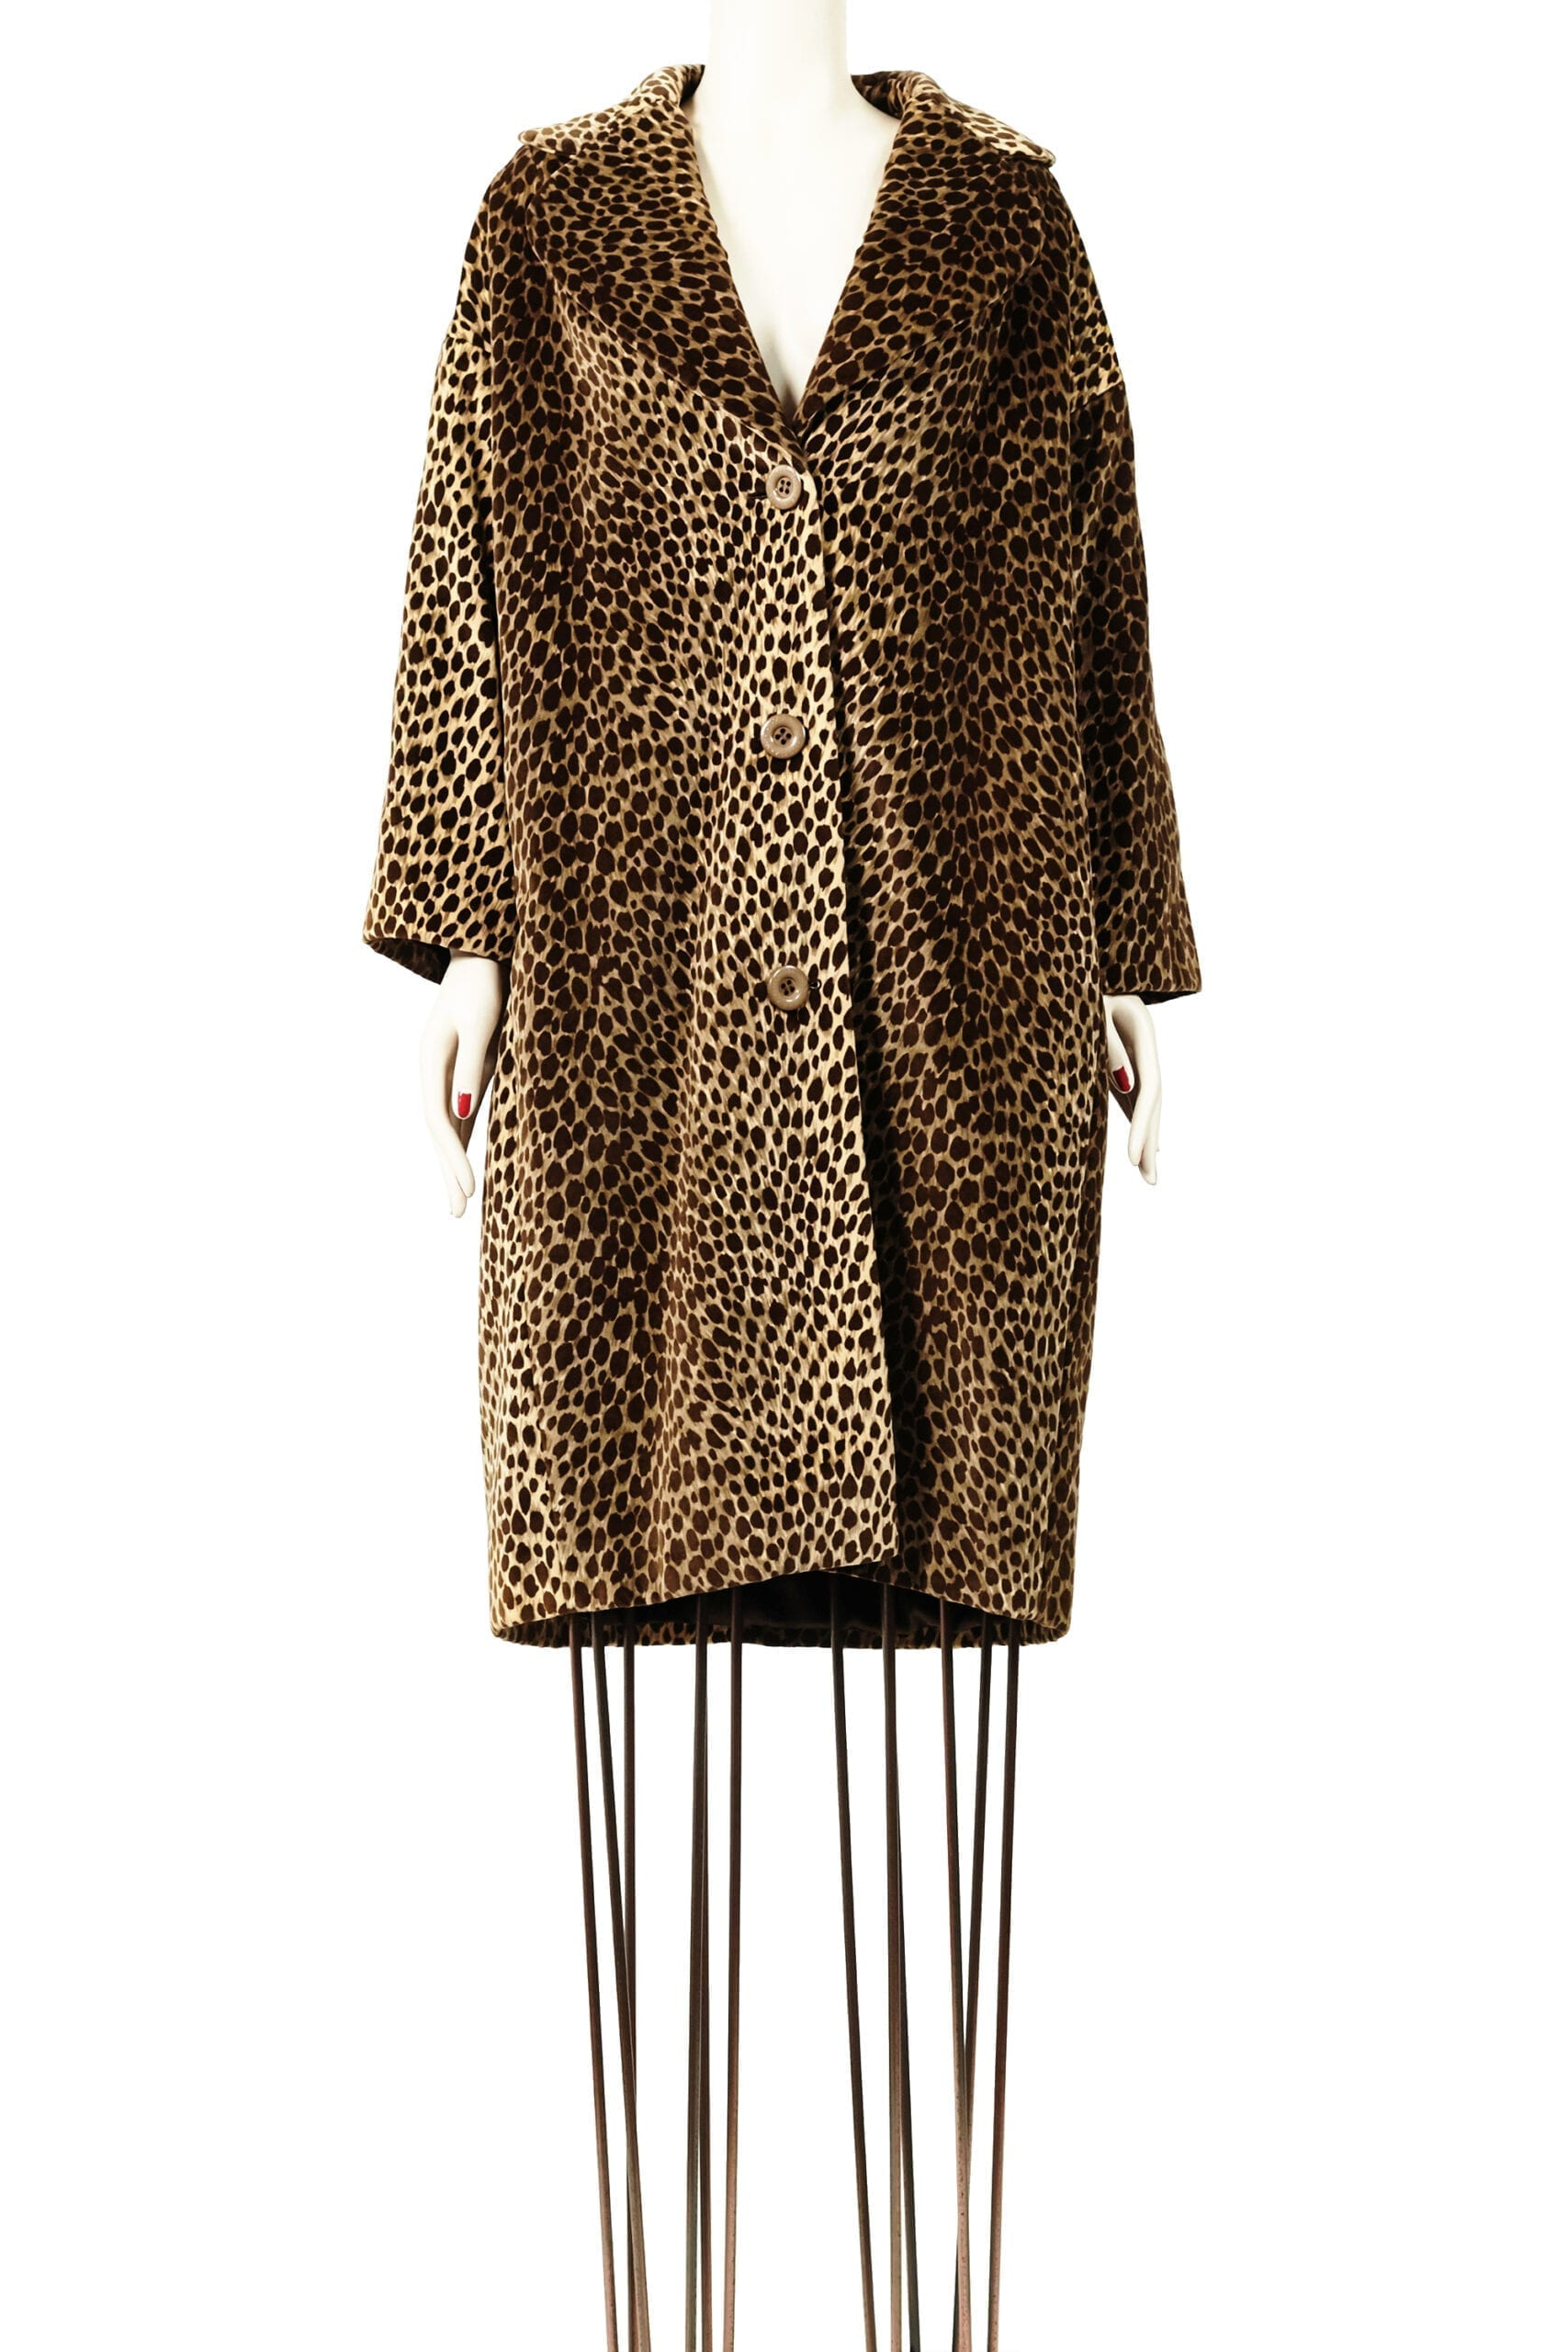 giaccone leopardato donna dolce e gabbana